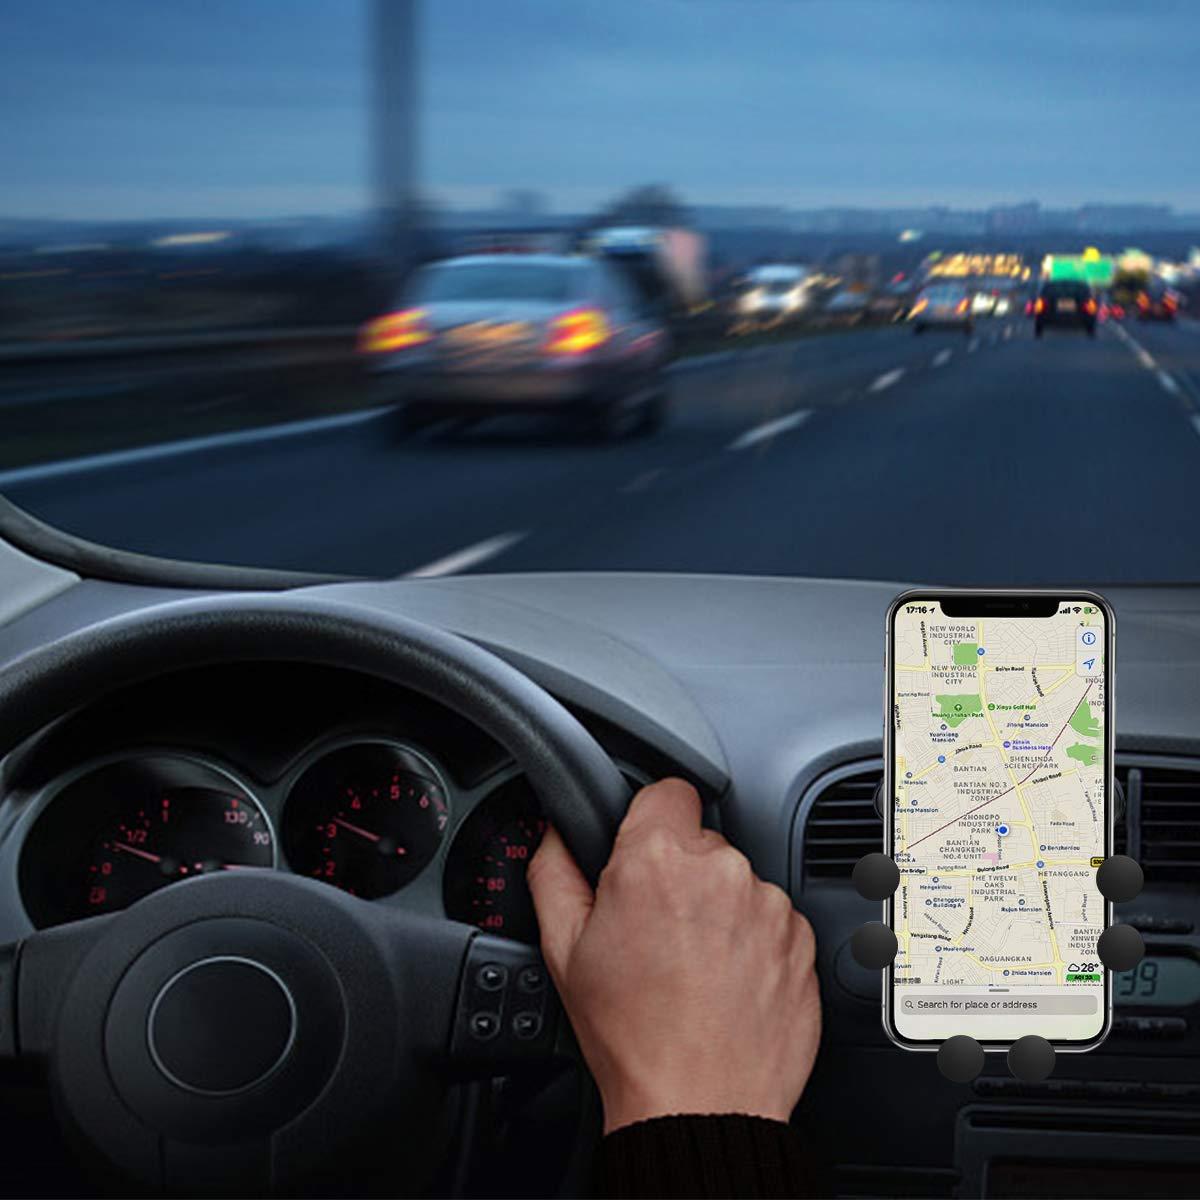 Universal Auto Air Vent Grip Gravity Car Phone Holder 2019 Nuovo Auto-Grip Car Phone Mount Supporto Automatico Telescopico gravit/à Staffa Air Vent Mount (CD-07